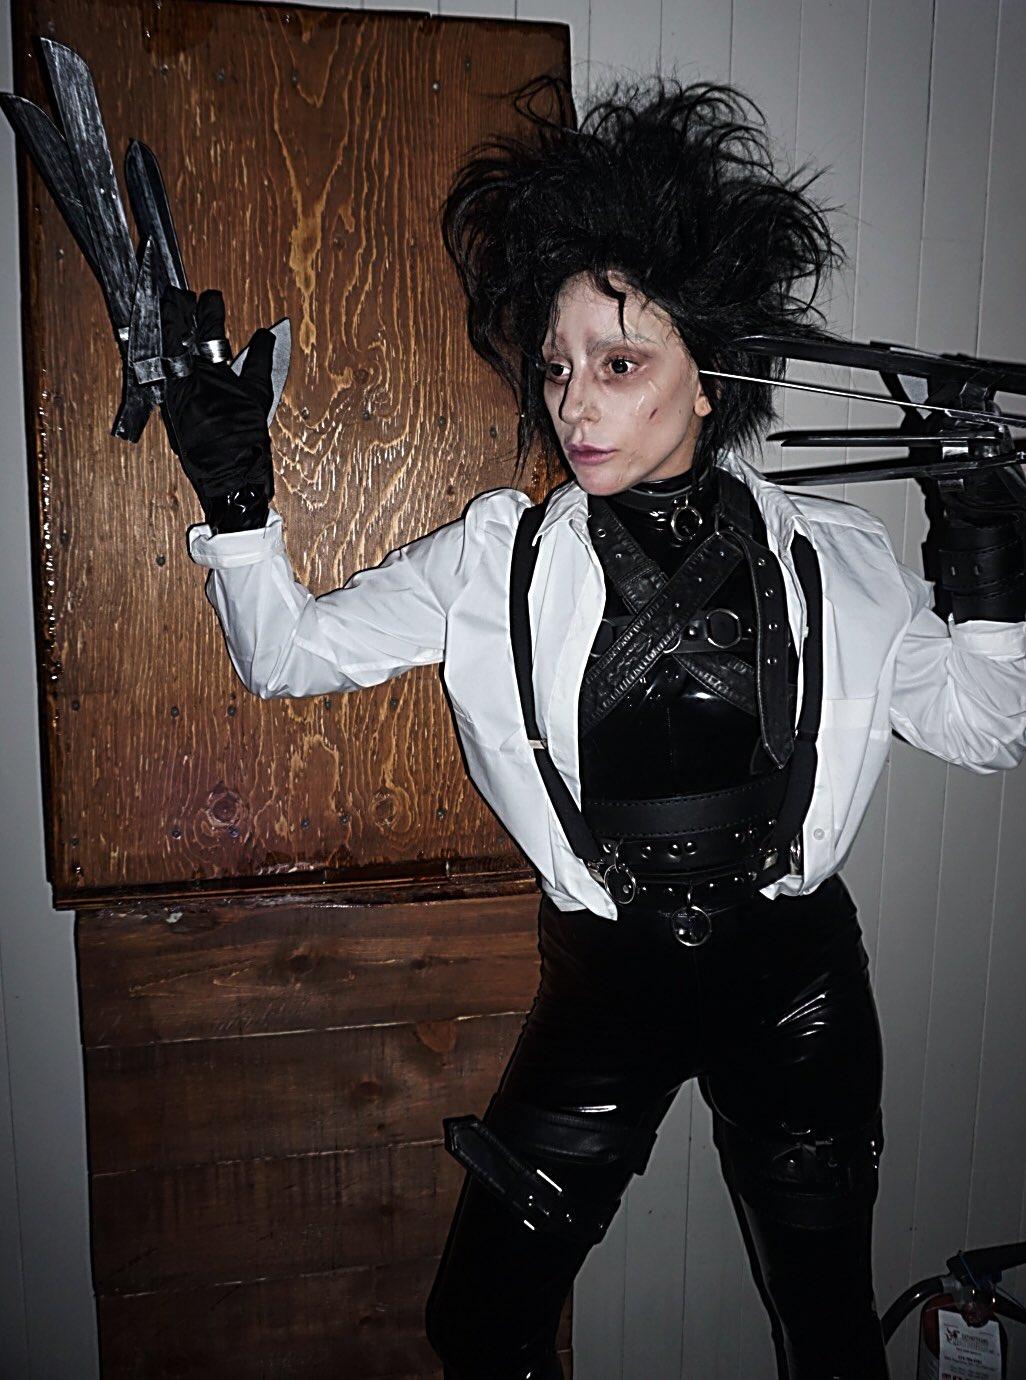 #Halloween #HAUS Edward Scissorhands ��✂️ https://t.co/FvHHVenDYd